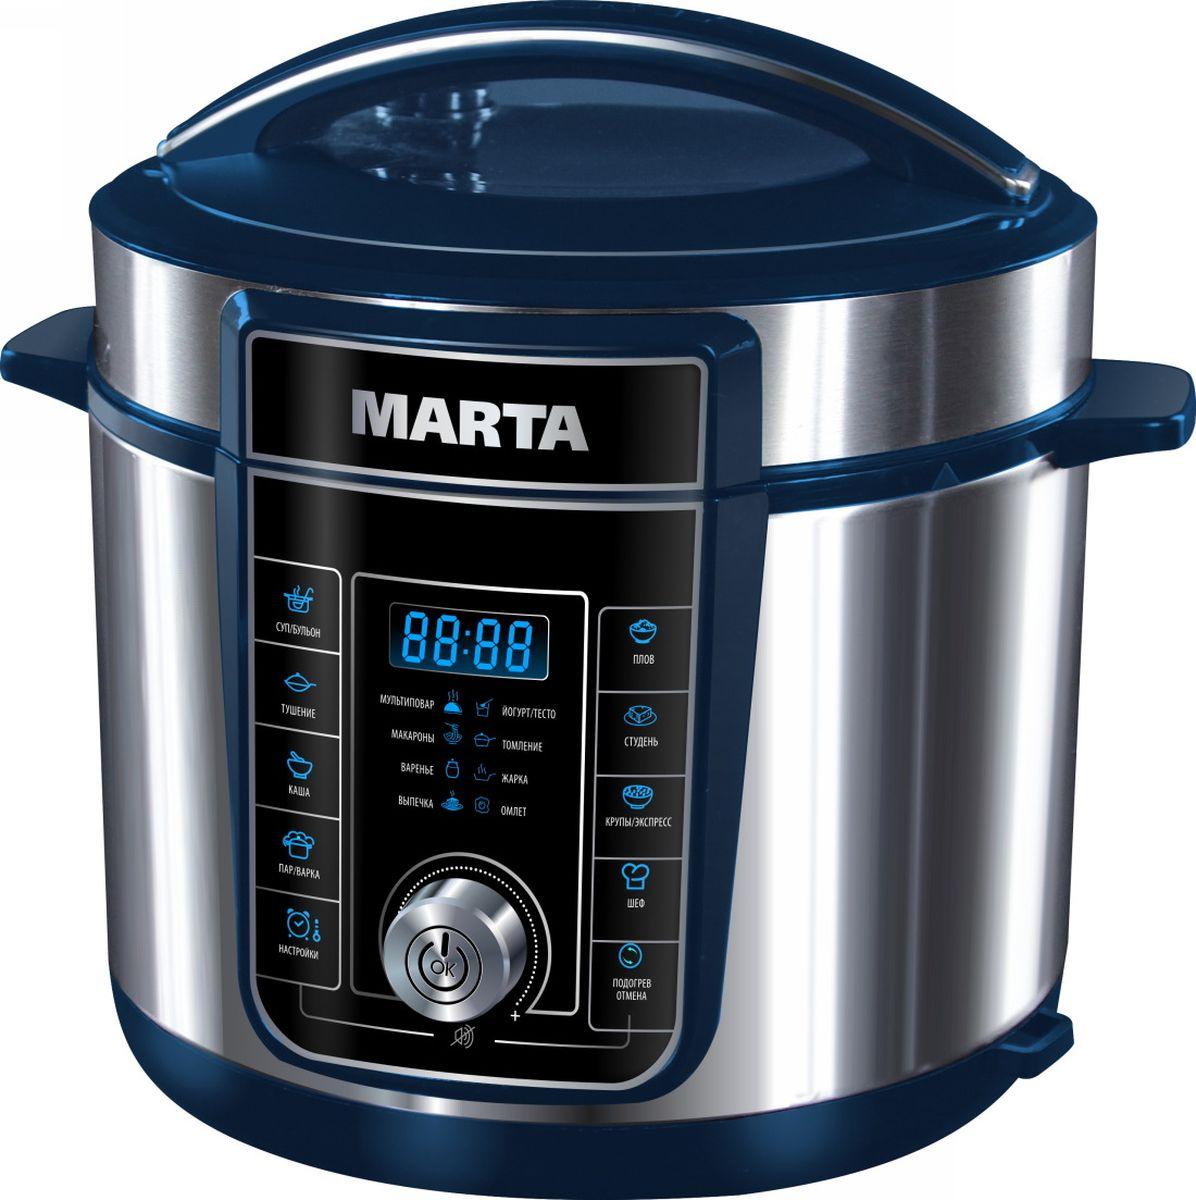 Marta MT-4321, Blue Sapphire мультиварка - Мультиварки